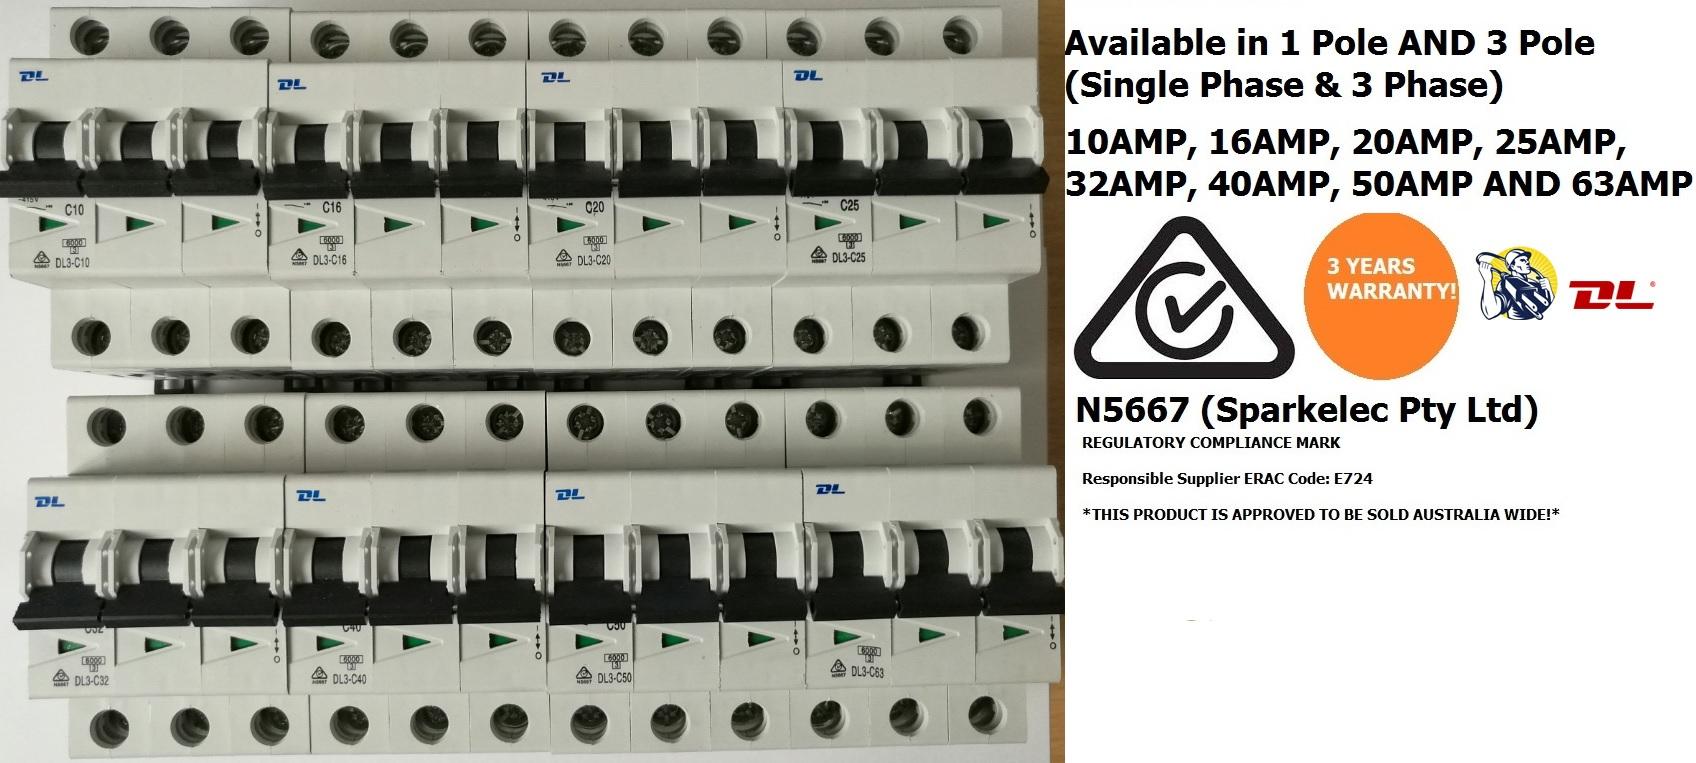 Three Phase Mcb Circuit Breaker 63amp 3 Years Warranty